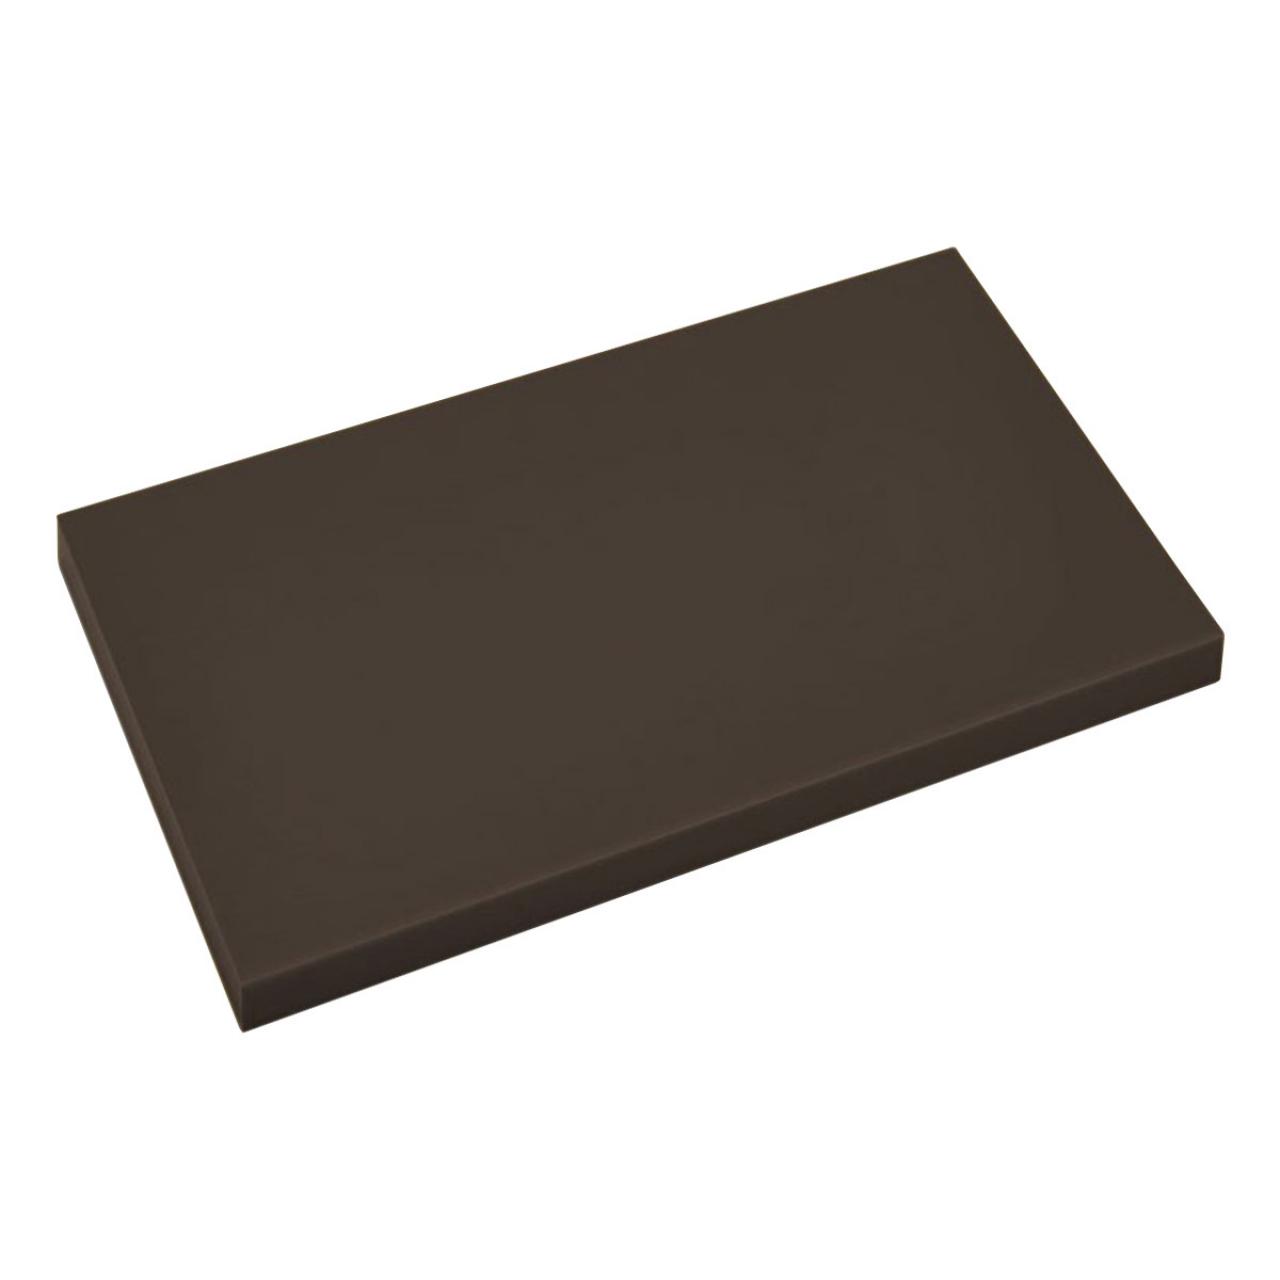 Cutting board 40x60cm brown